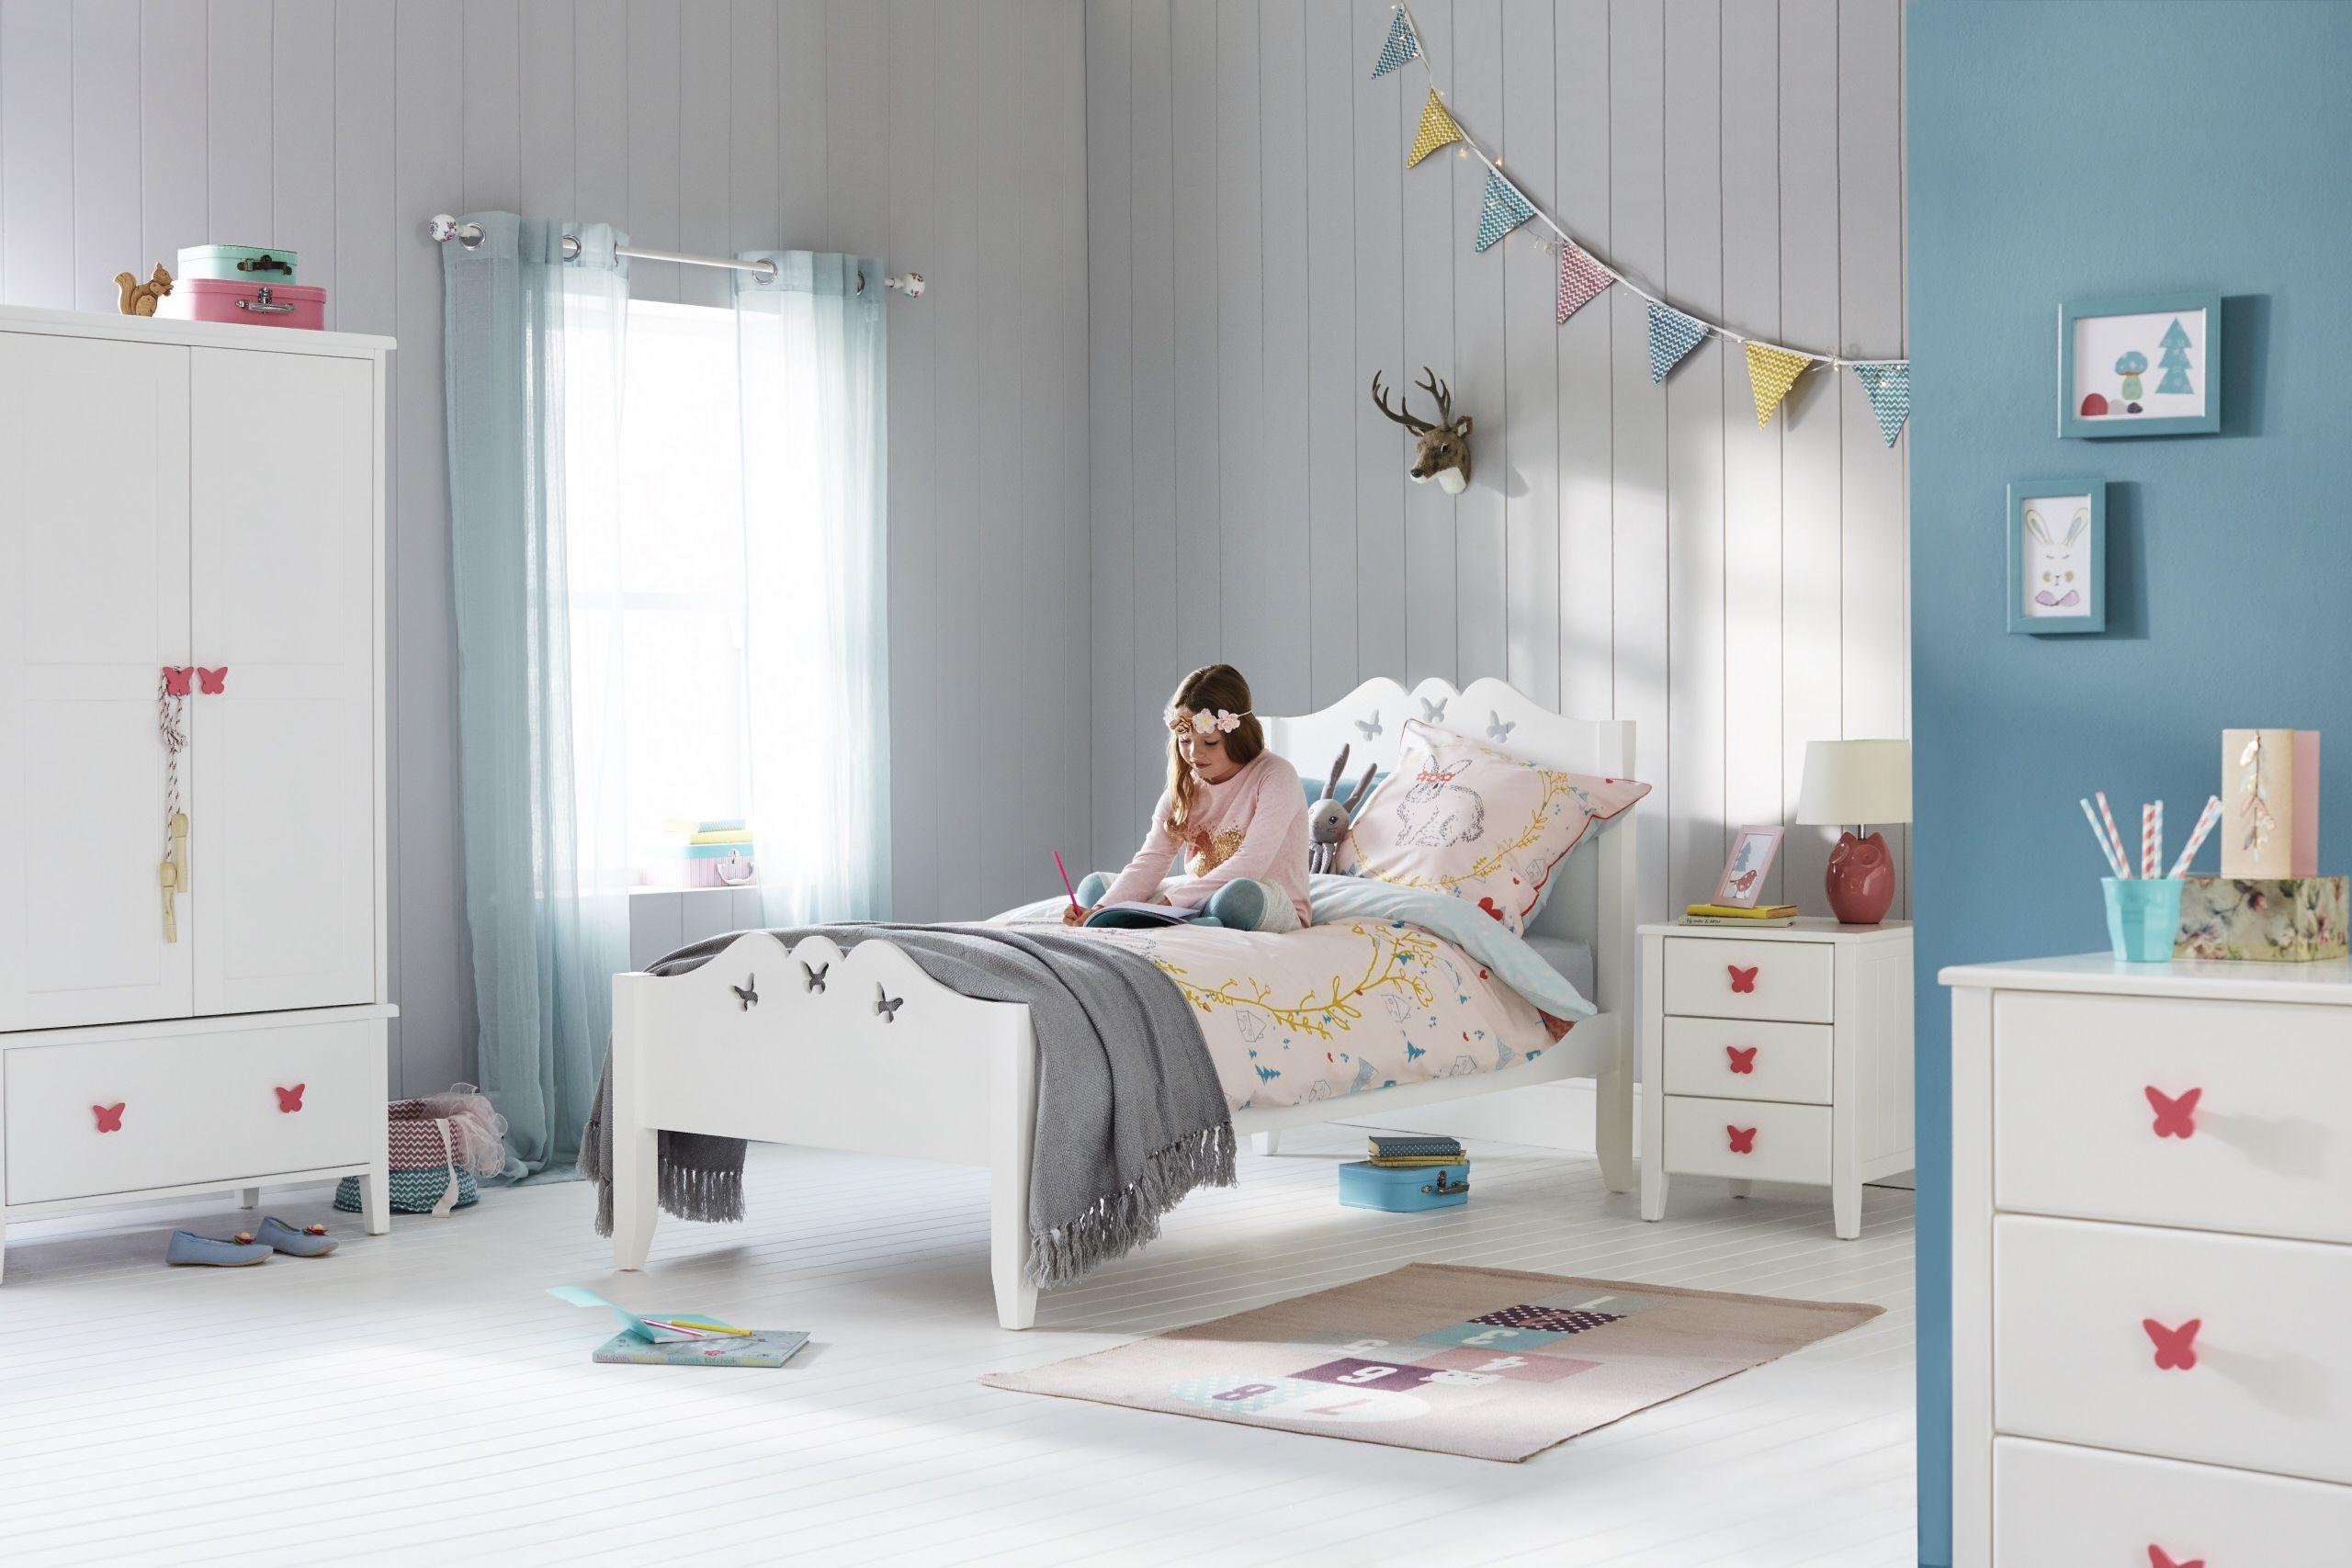 Pin de Number 21 Interiors en Styling for Furniture Village | Pinterest